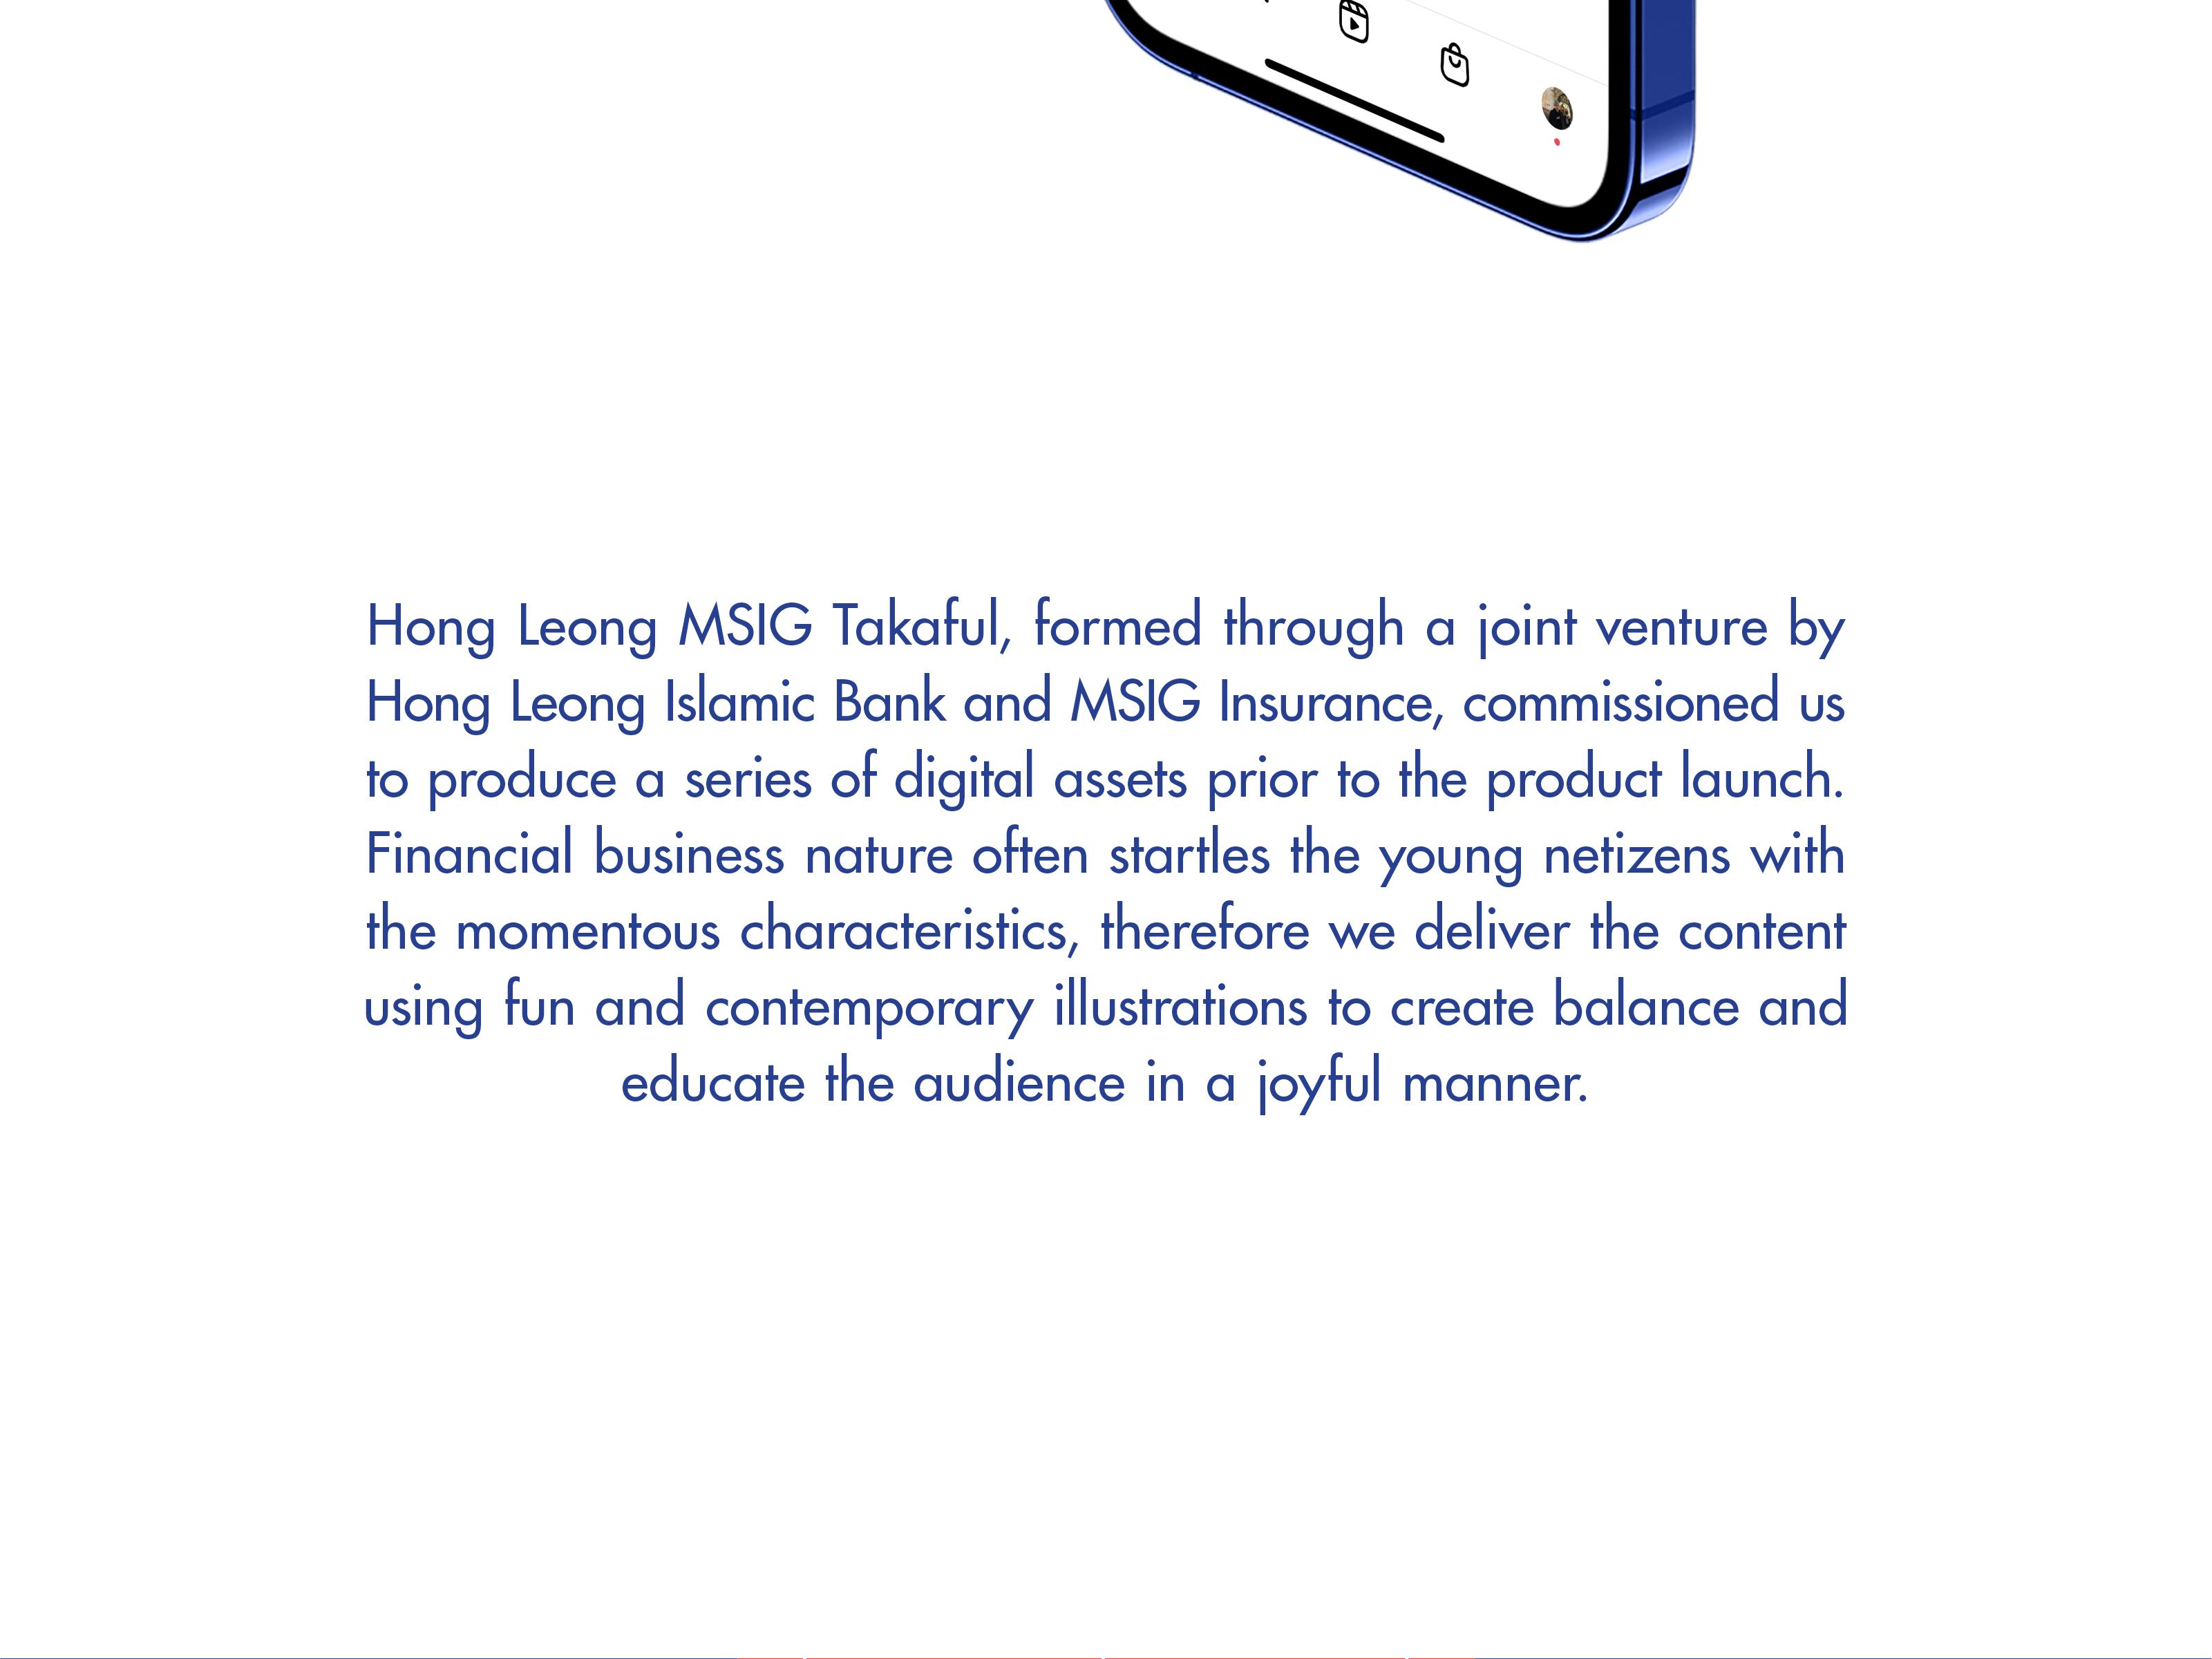 Hong-Leong-MSIG-Takaful_Digital-Visual_portfolio_2.jpg